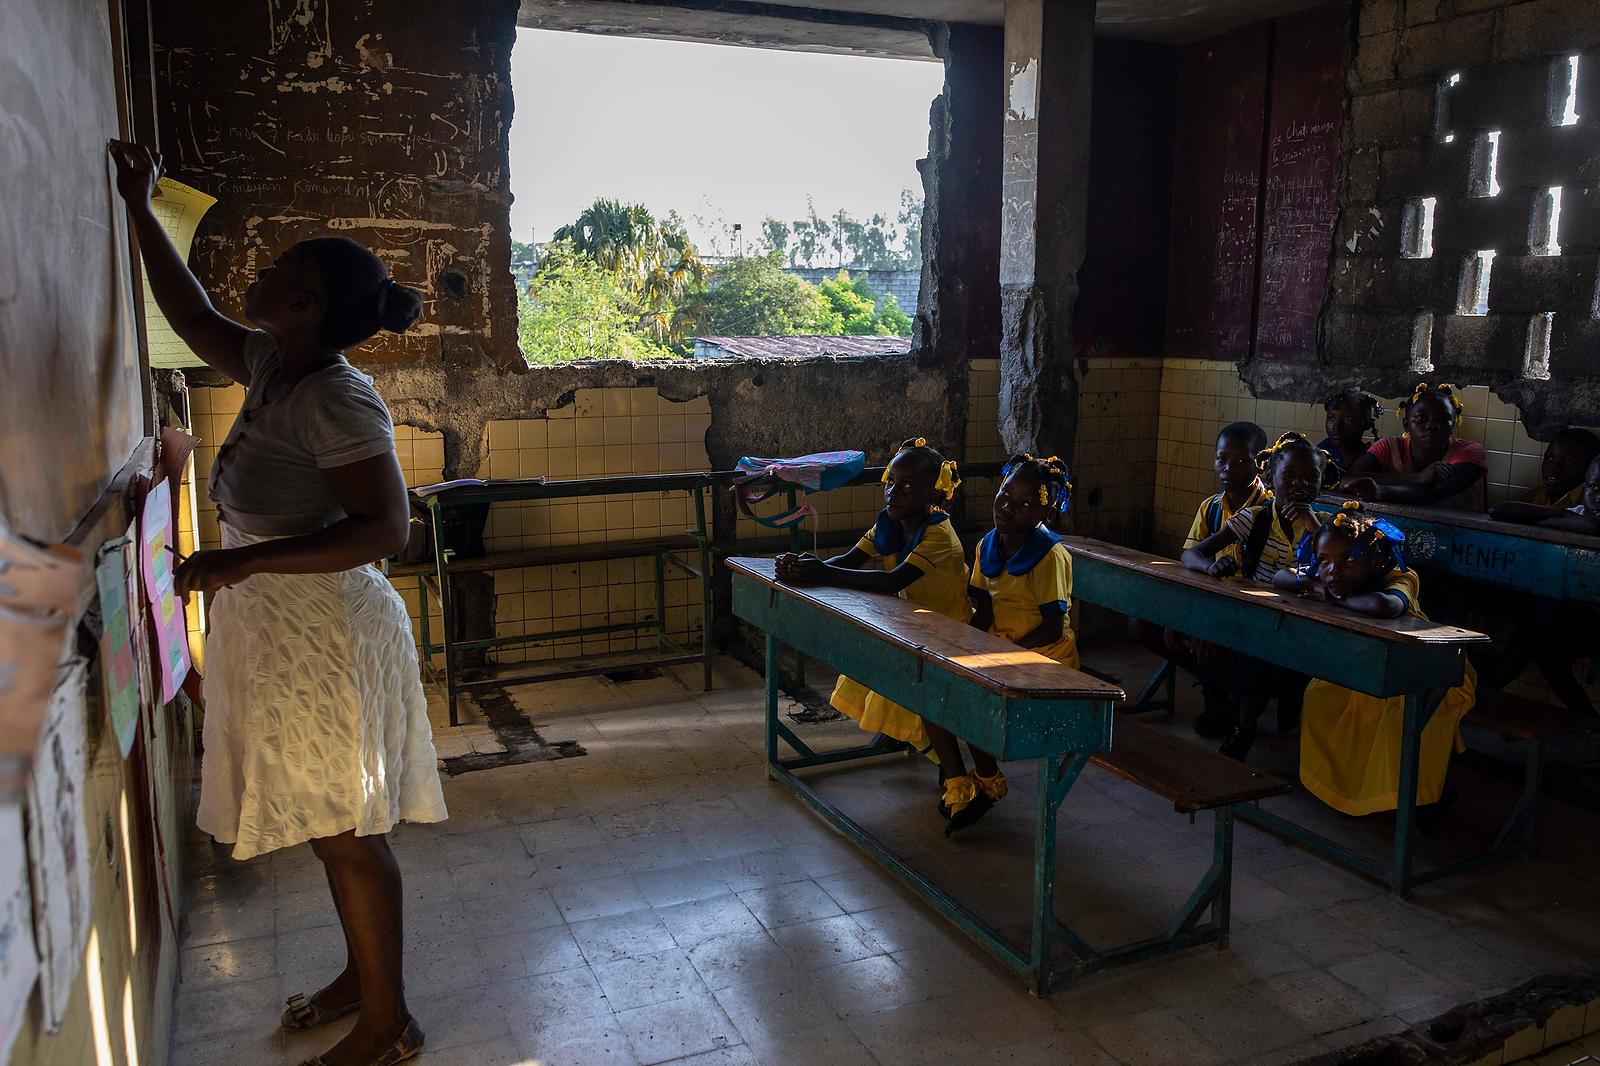 A teacher writes on a blackboard during a class in Sante Bernadette school, inside Fort Dimanche, once a prison where the late Haitian dictator Francois 'Papa Doc' Duvalier imprisoned his enemies in Port-au-Prince, Haiti, Thursday, Sep. 23, 2021. AP